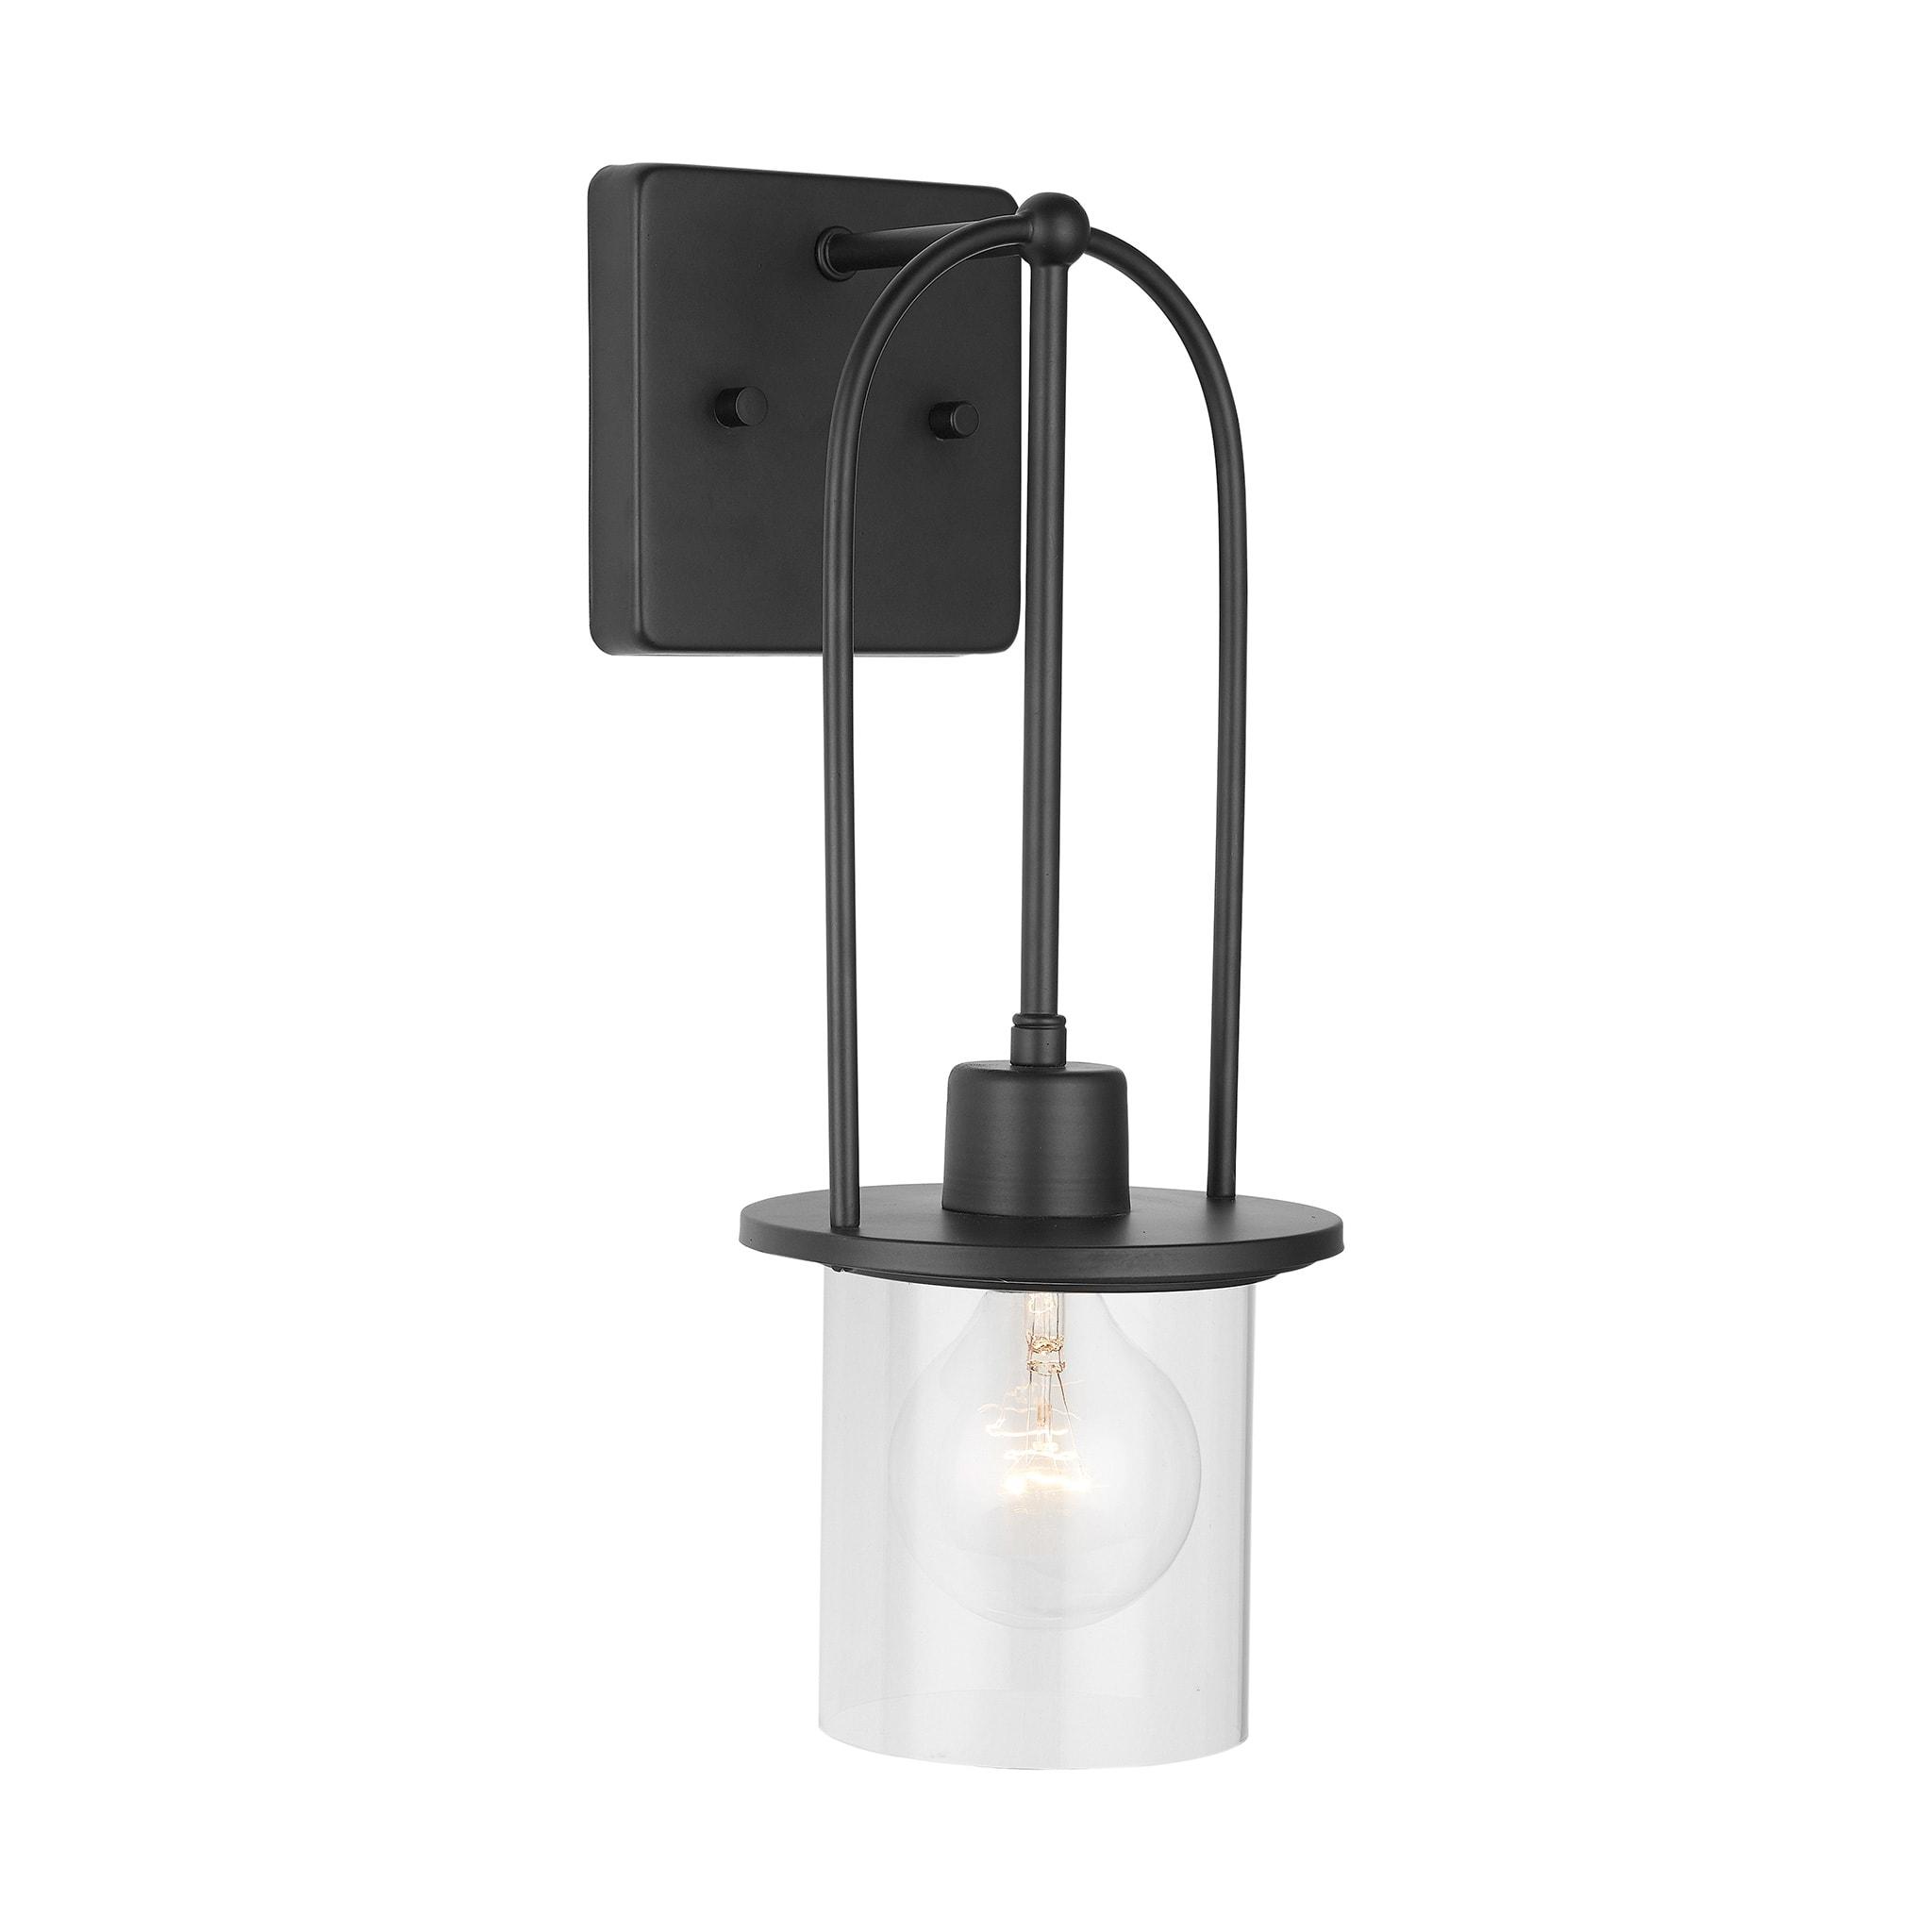 Image of: Bellevue Ca9d321a Mb Matte Black Single Light 16 Tall Bathroom Sconce Lightingdirect Com